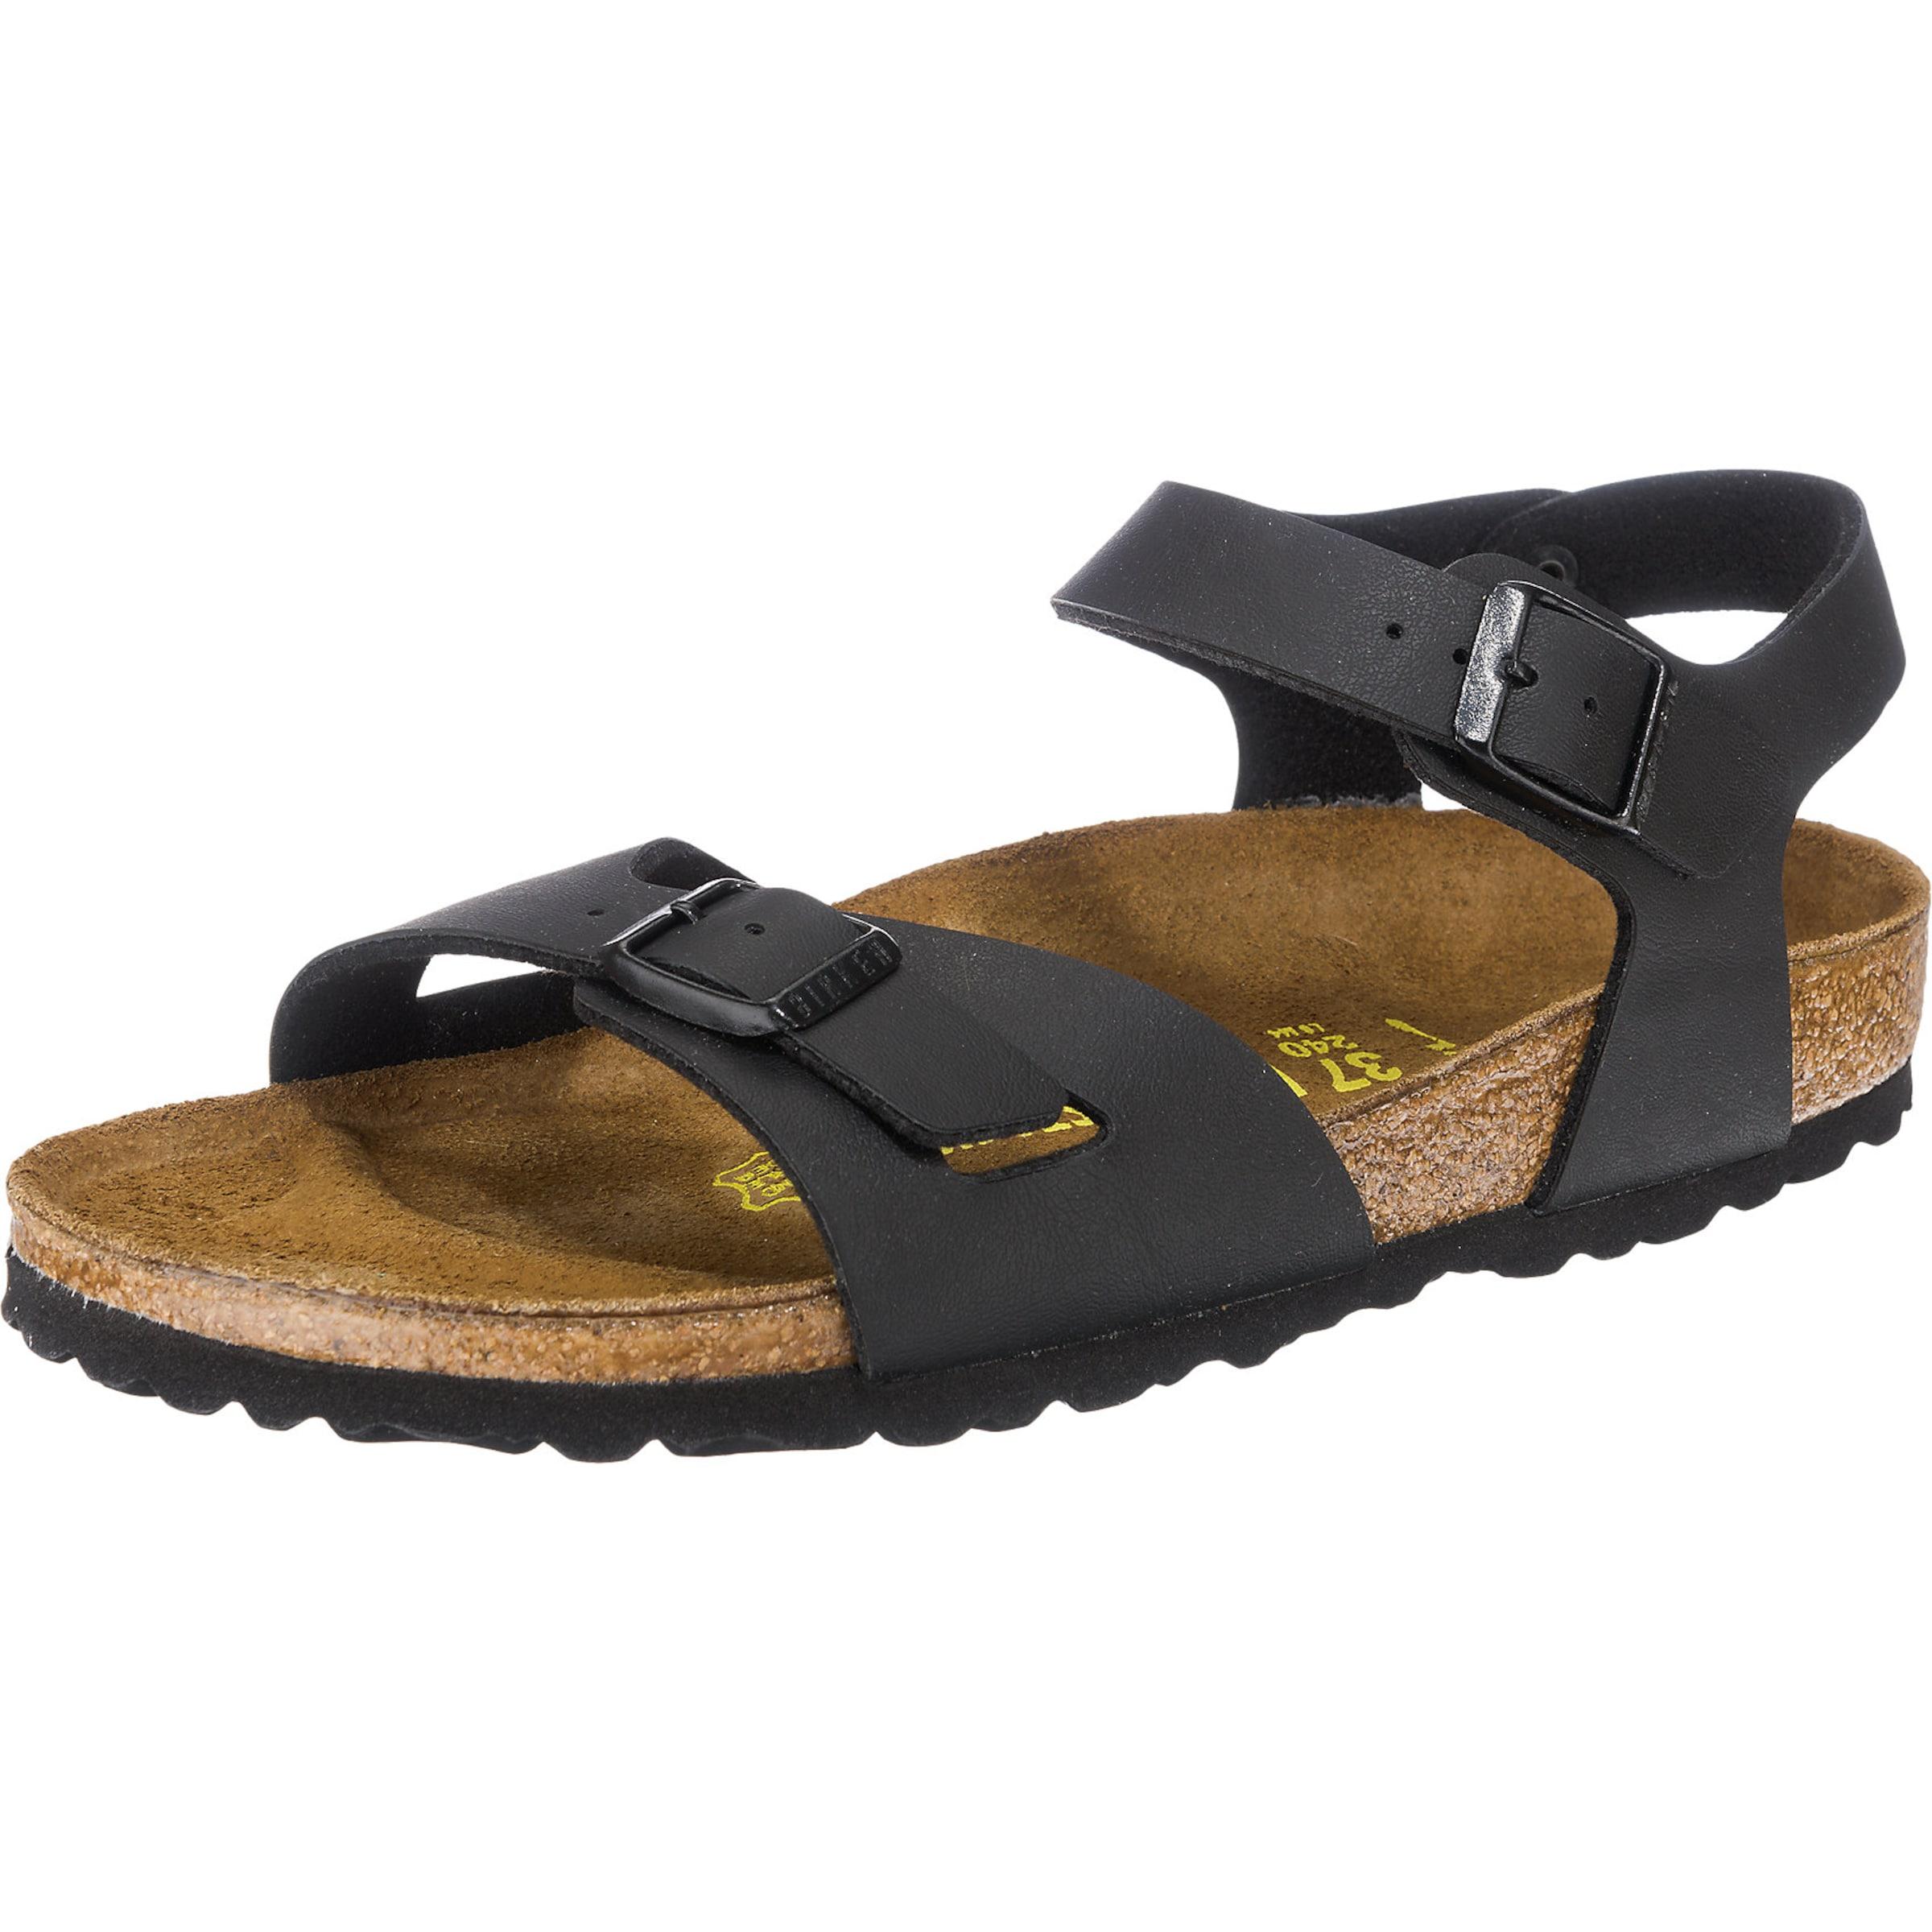 Haltbare Mode billige Schuhe BIRKENSTOCK | 'Rio' schmal Sandaletten Schuhe Gut getragene Schuhe